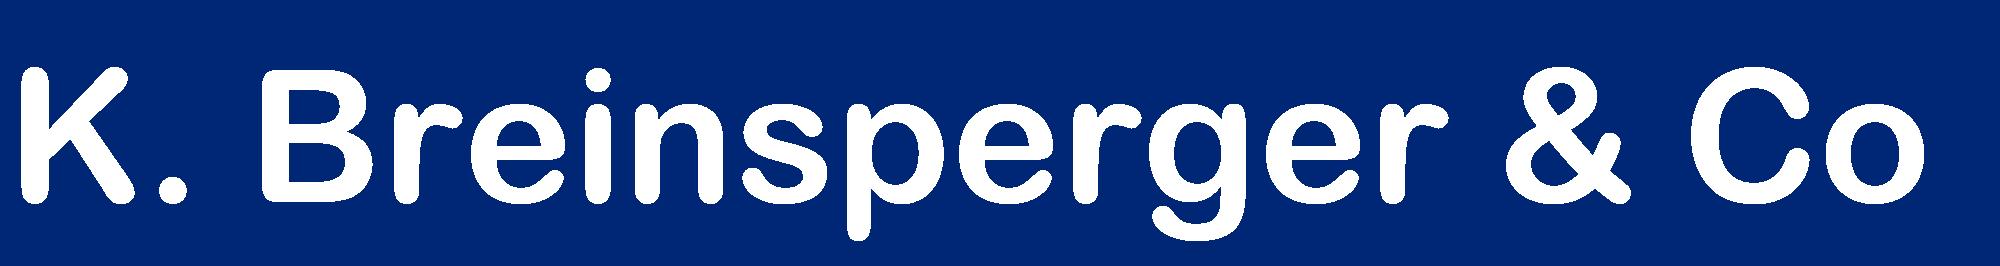 K. Breinsperger & Co. e. U. SAP Unternehmensberatung Ing. Breinsperger